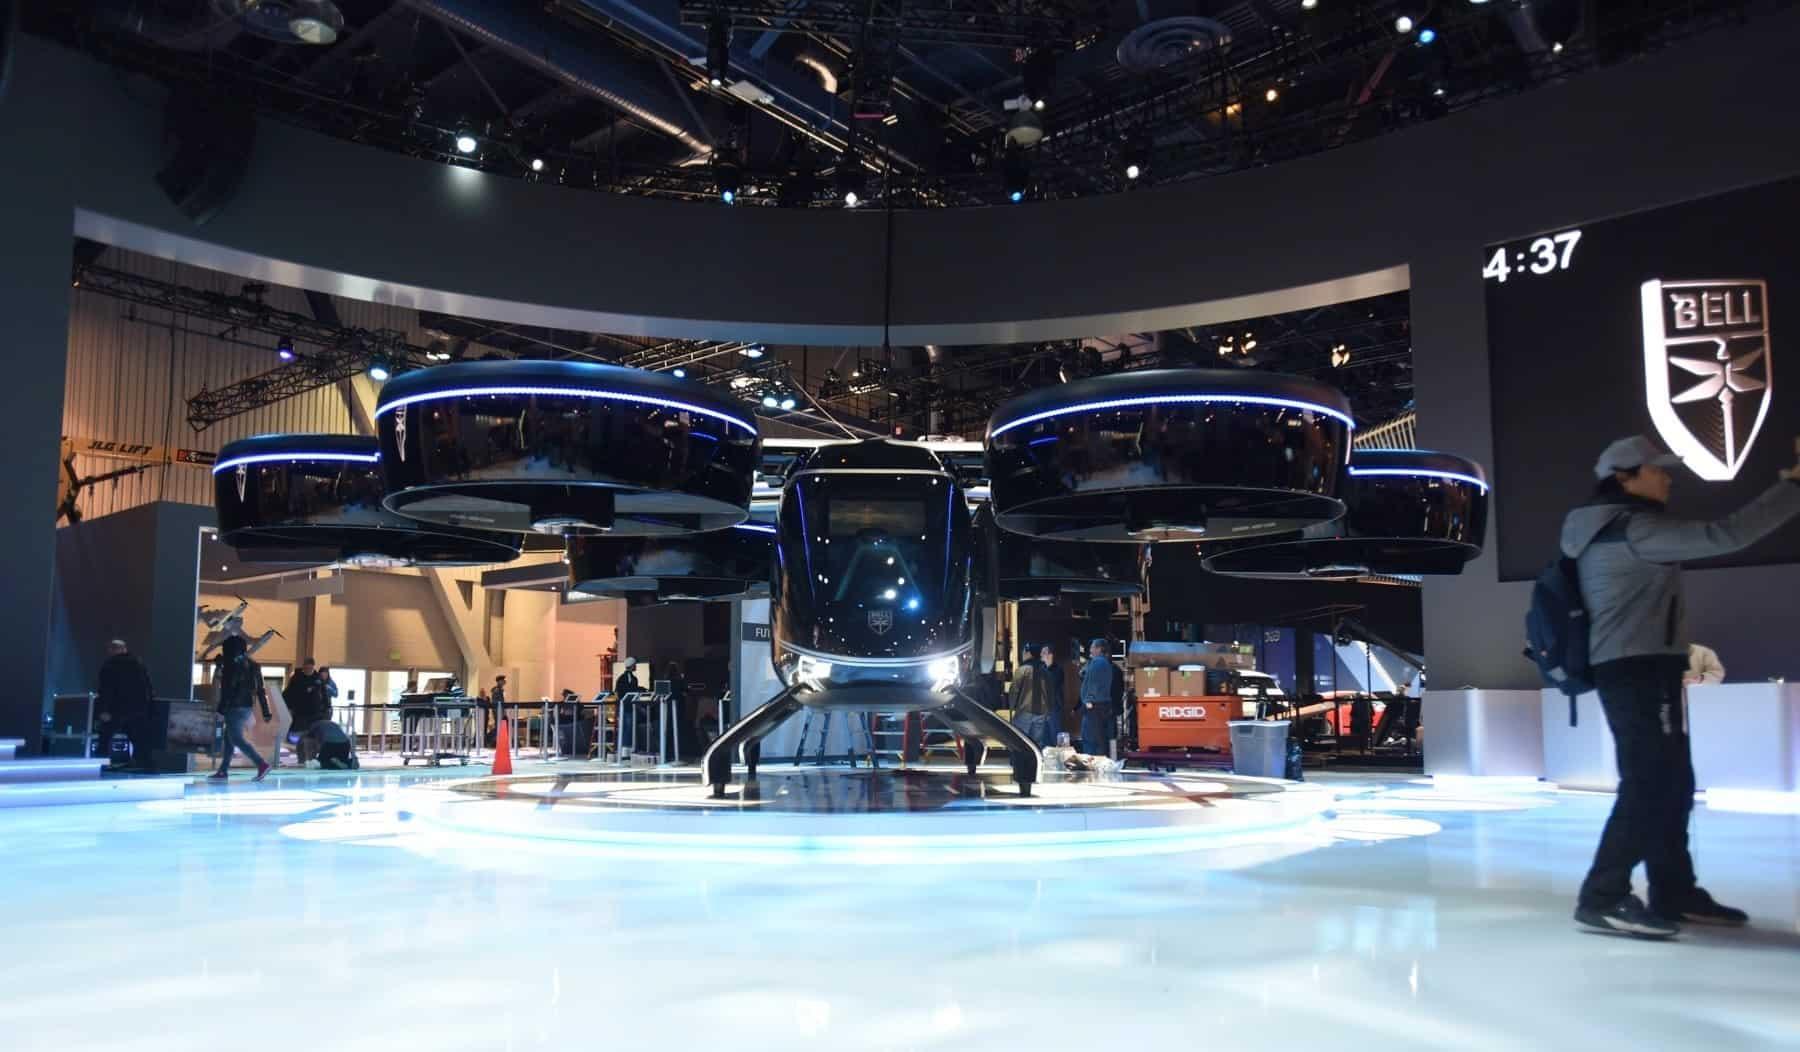 Drone Bell Nexus